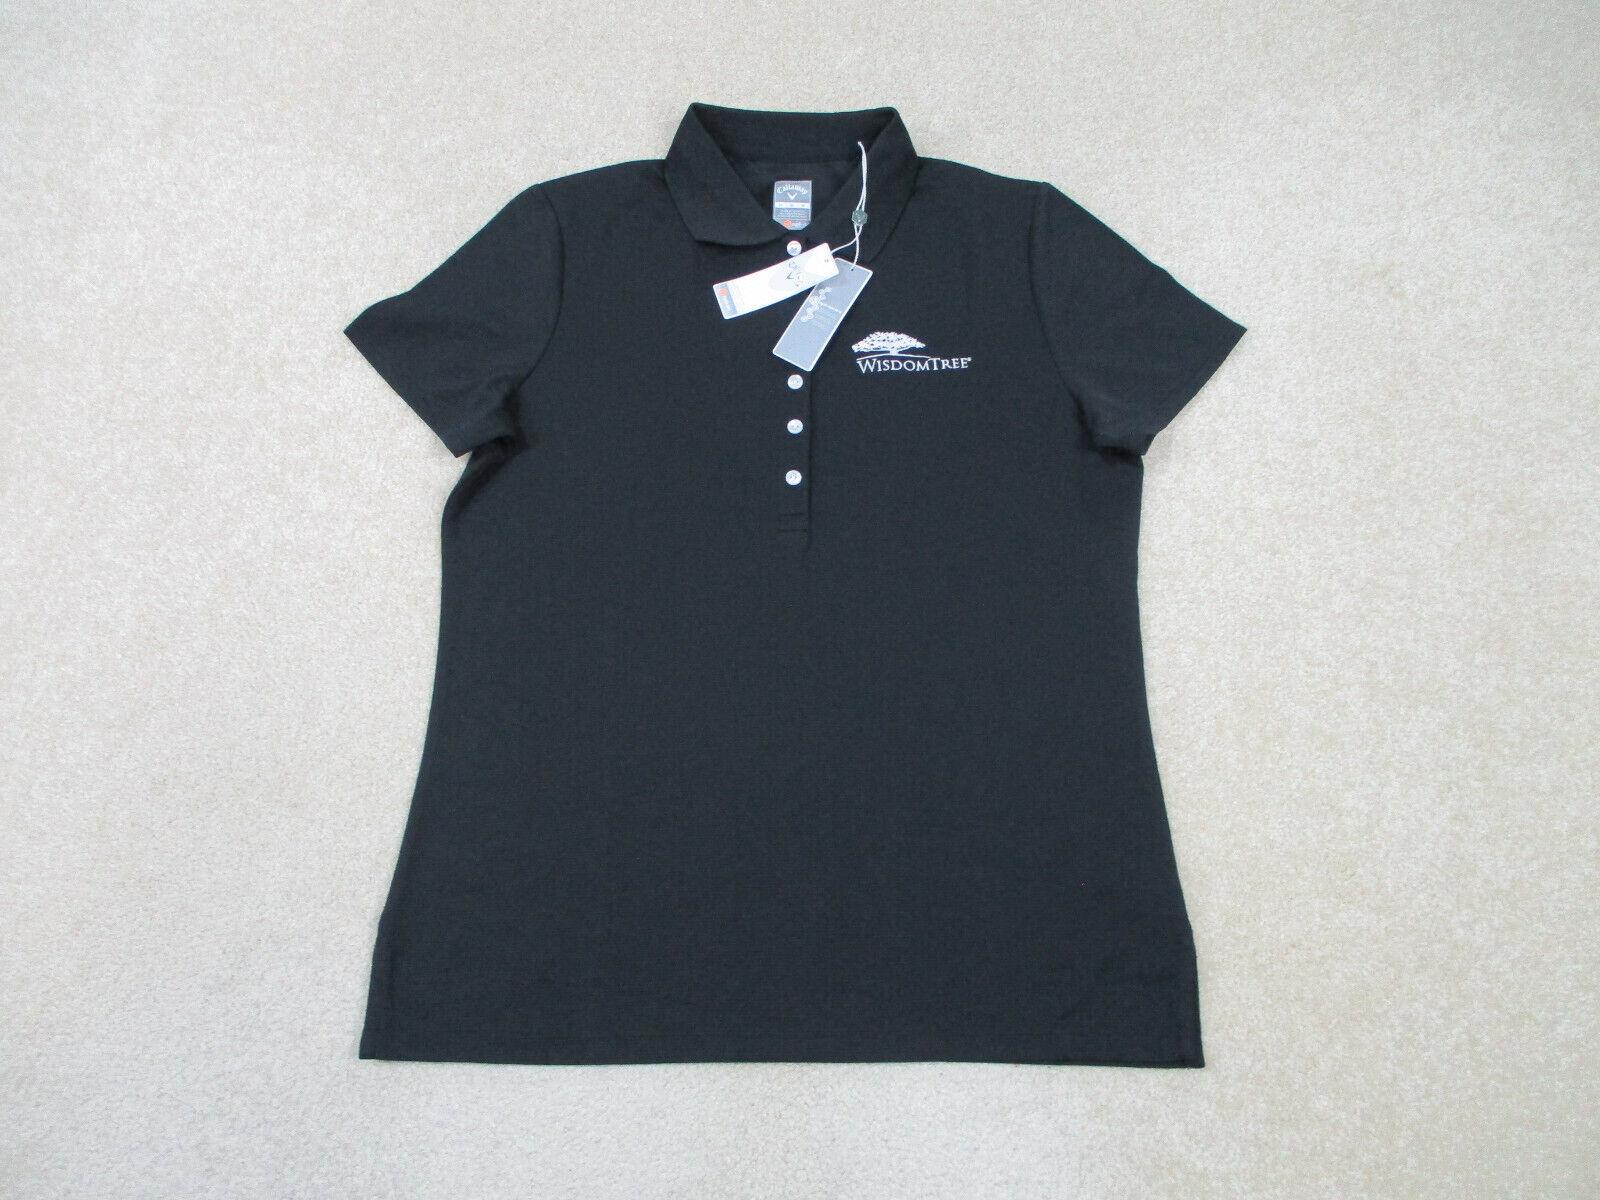 NEW Callaway Polo Shirt Women Medium Black Lightweight Golfer Rugby Ladies